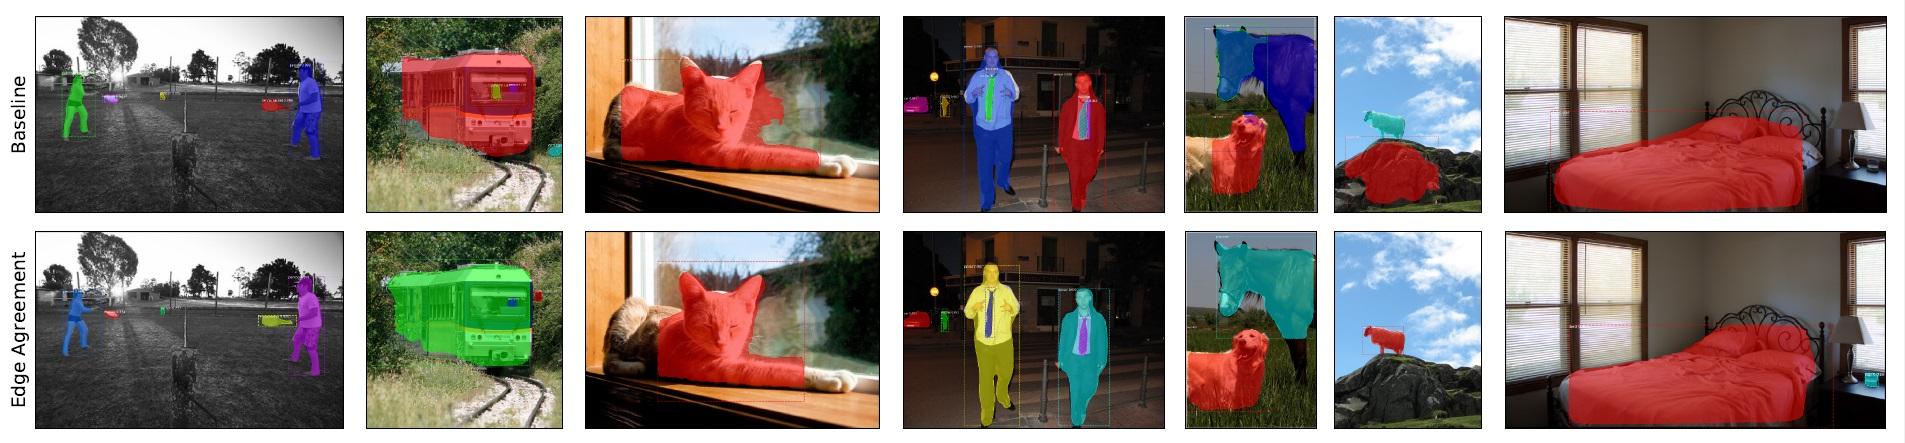 Instance Mask Visualizations